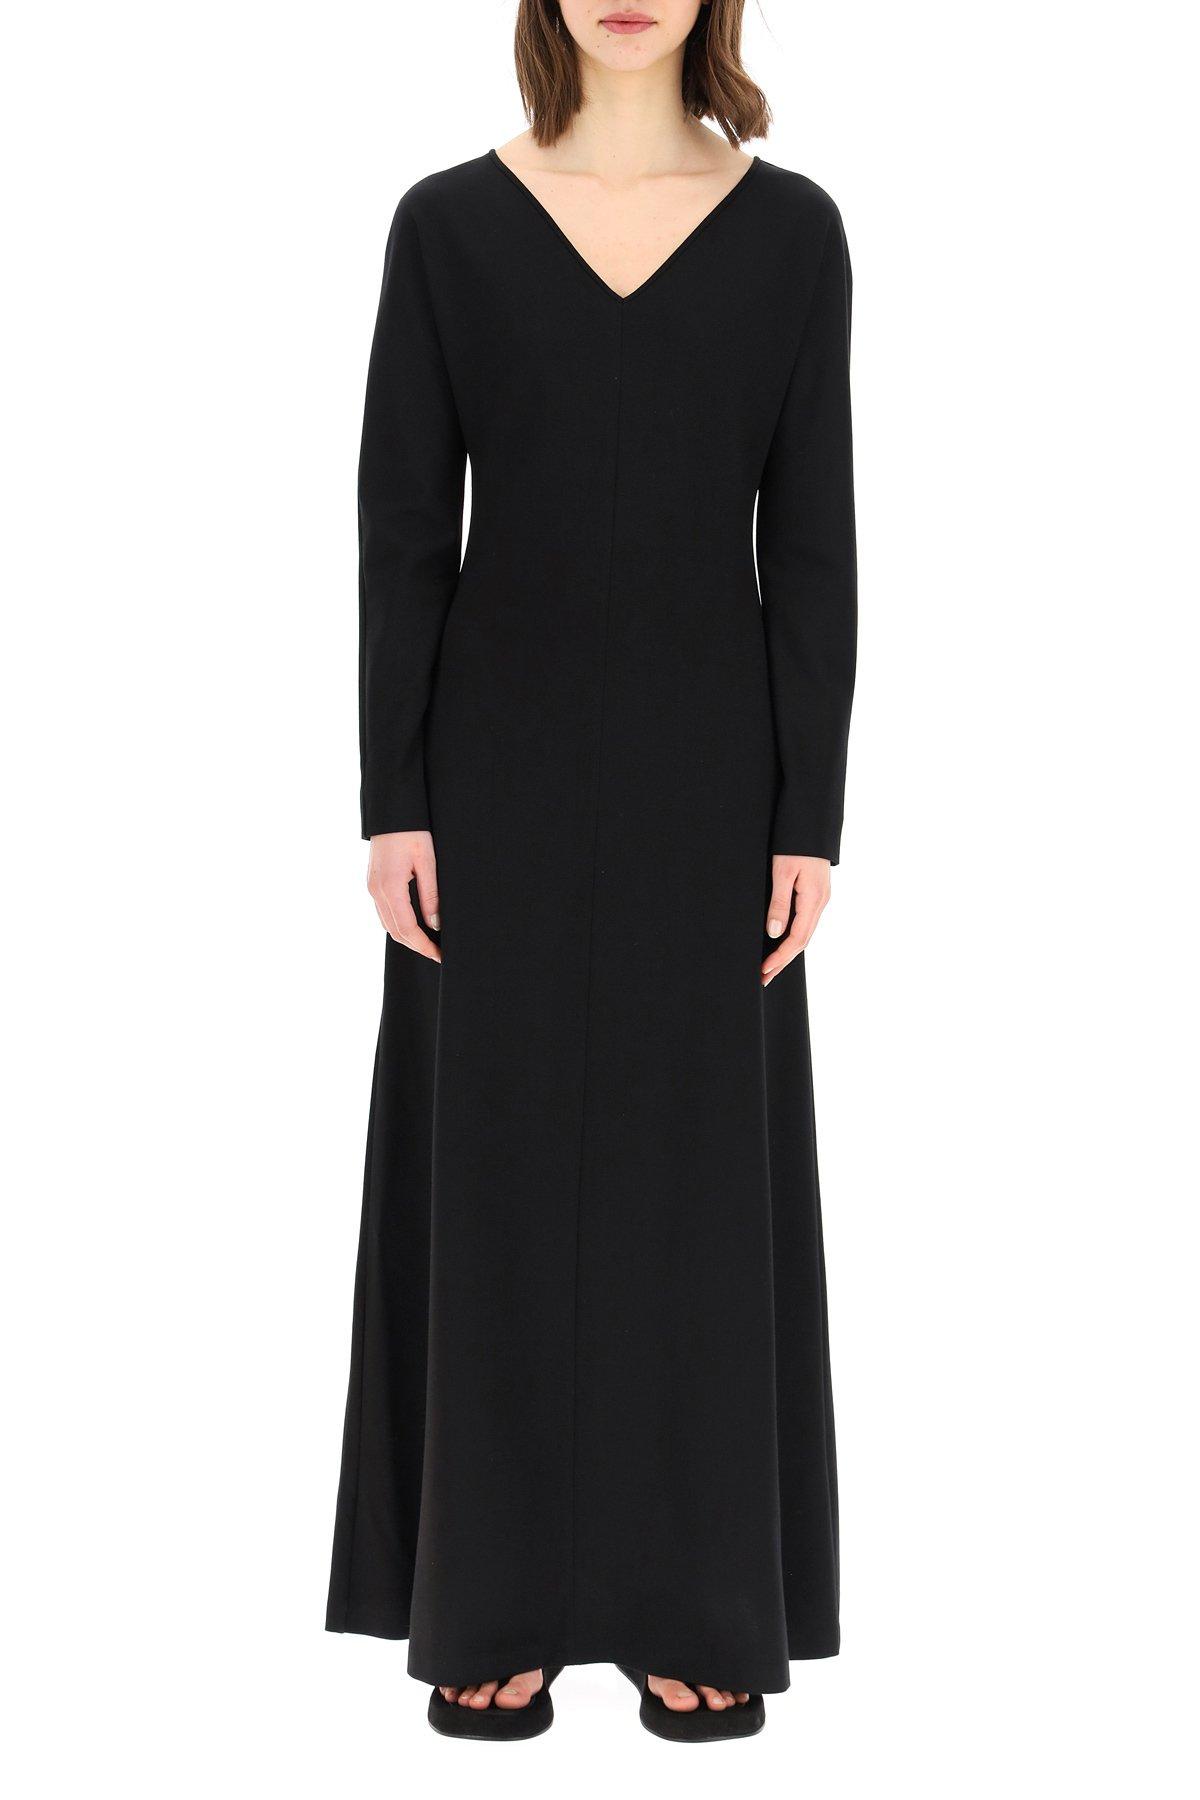 The row abito lungo clivia